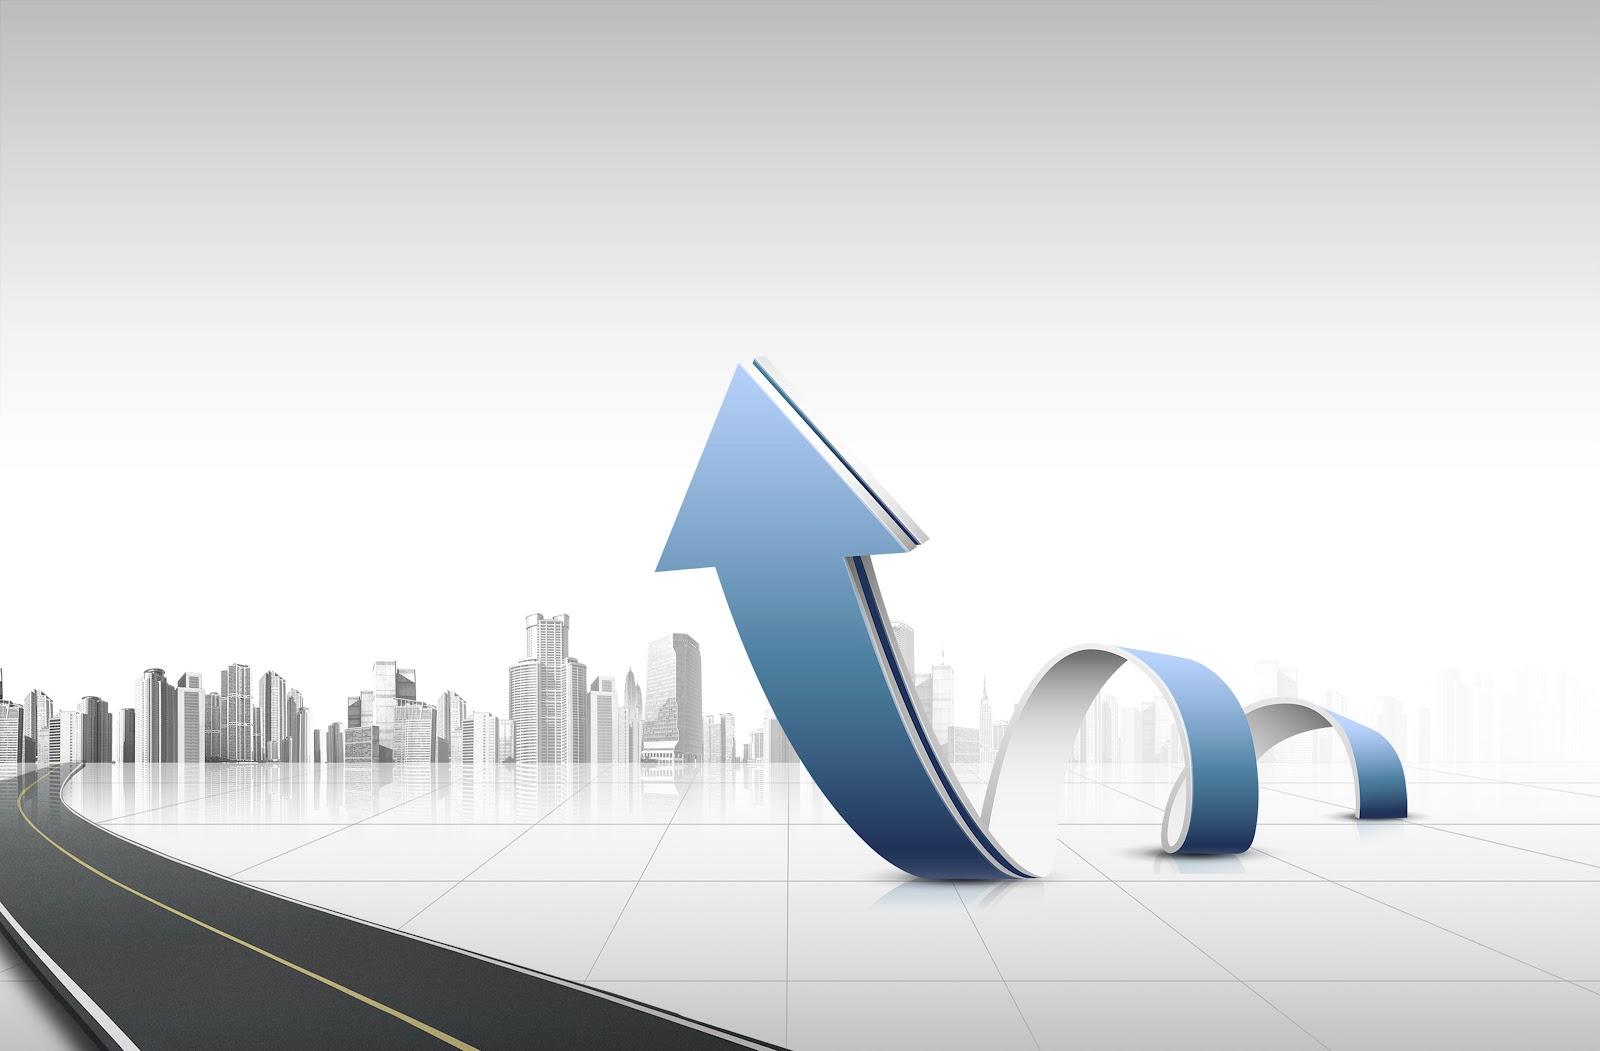 Hd Business Wallpaper Professional Background Hd Design 1600x1051 Wallpaper Teahub Io